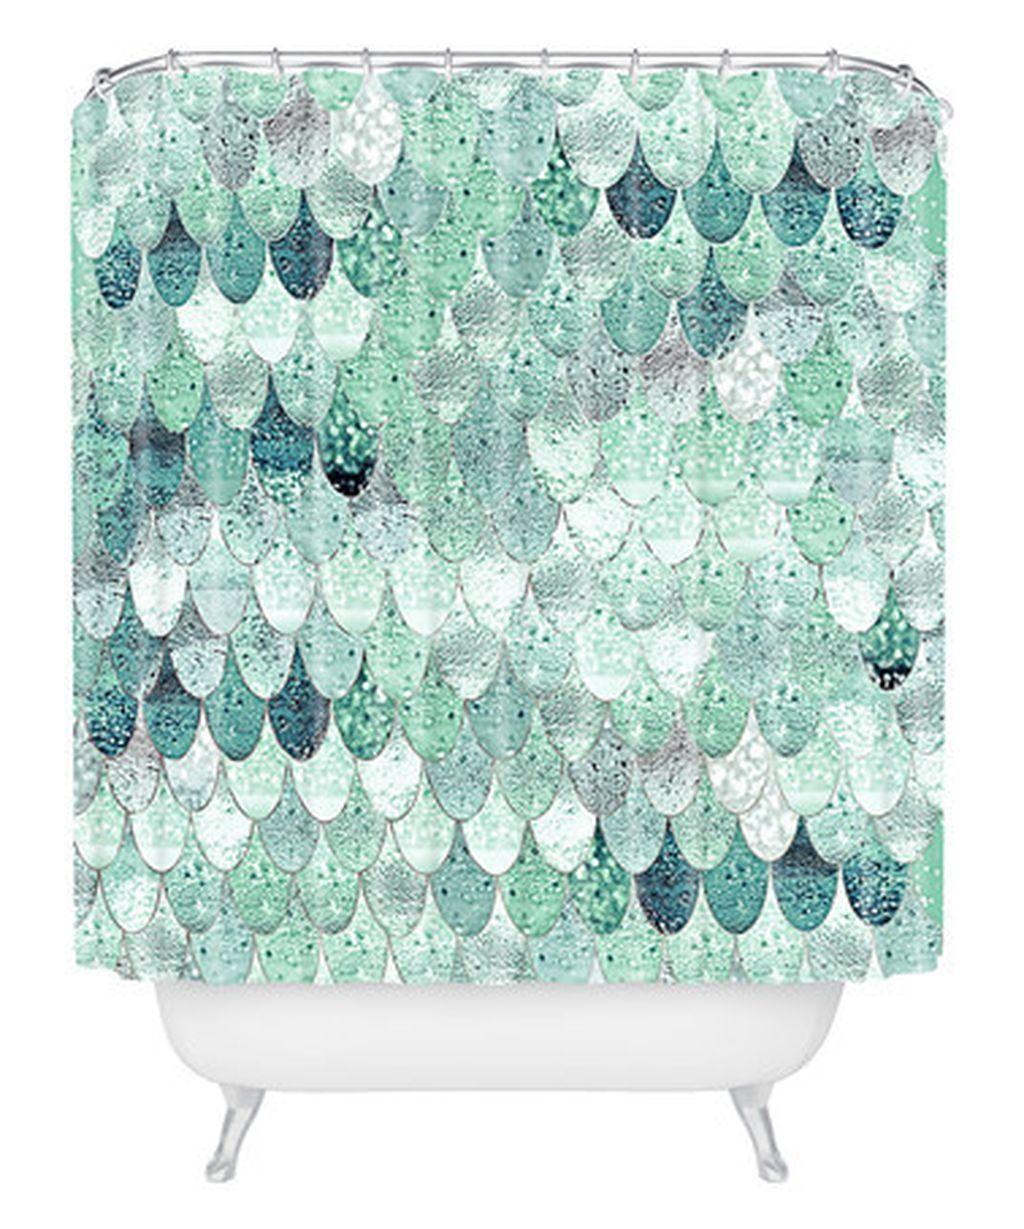 Dorm Bathroom Mint Shower Curtains Bathrooms Mermaid